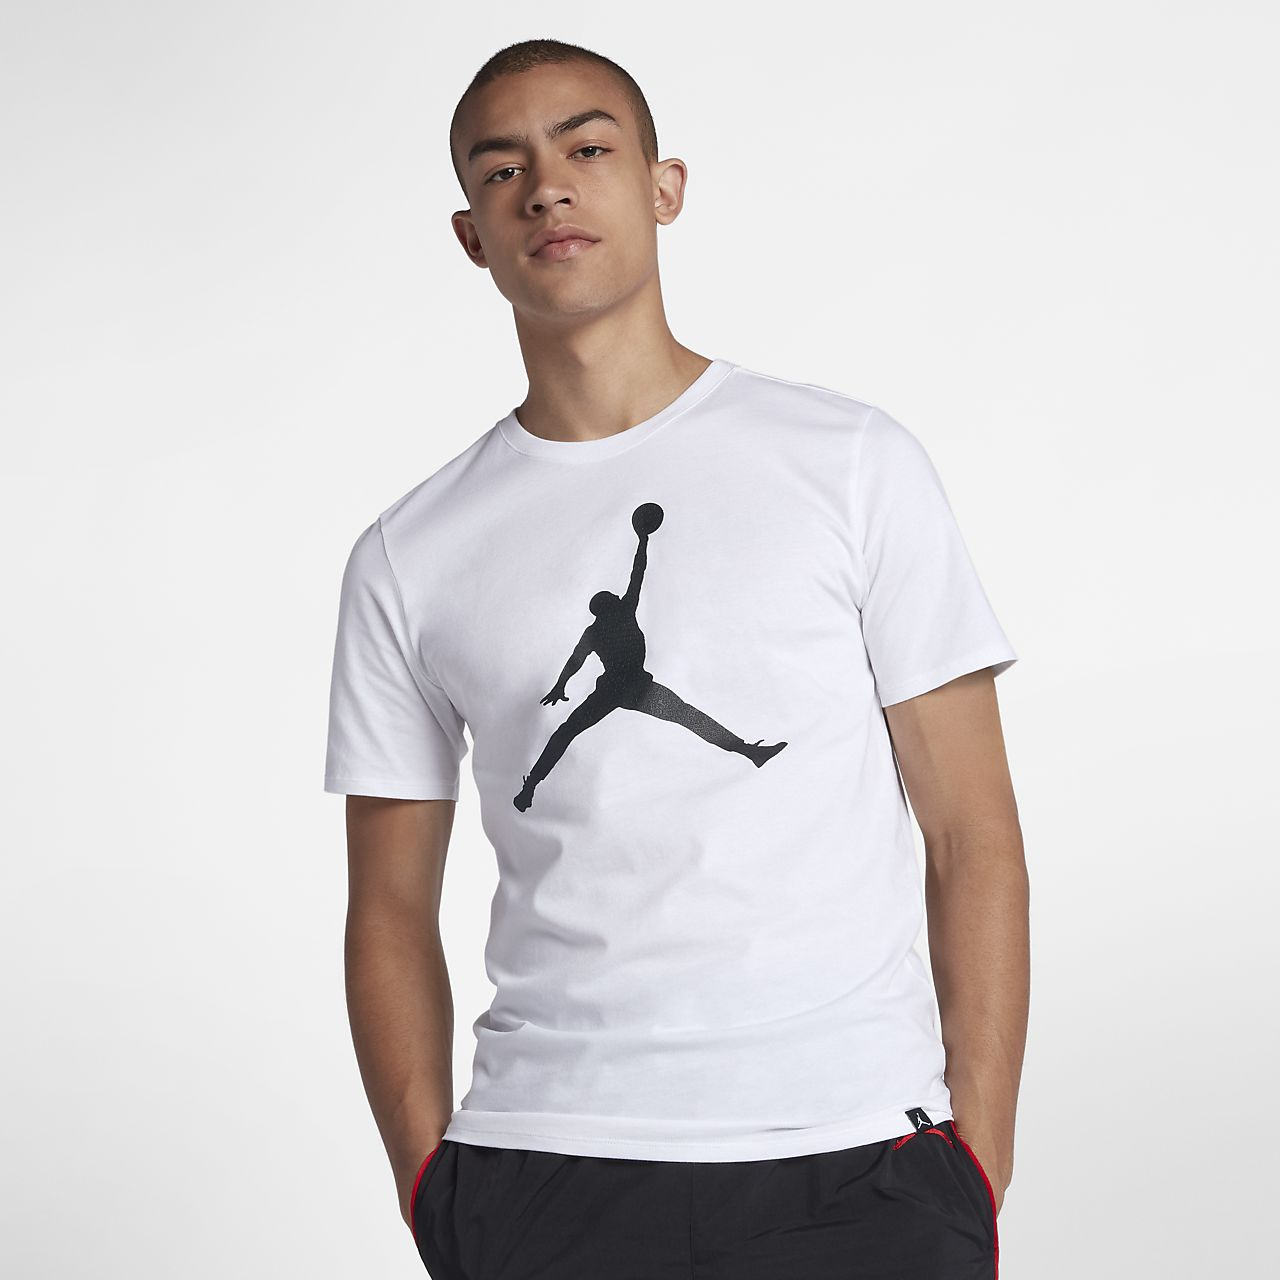 Jordan Lifestyle Iconic Jumpman Men s T-Shirt. Nike.com FI 14980b03ae2